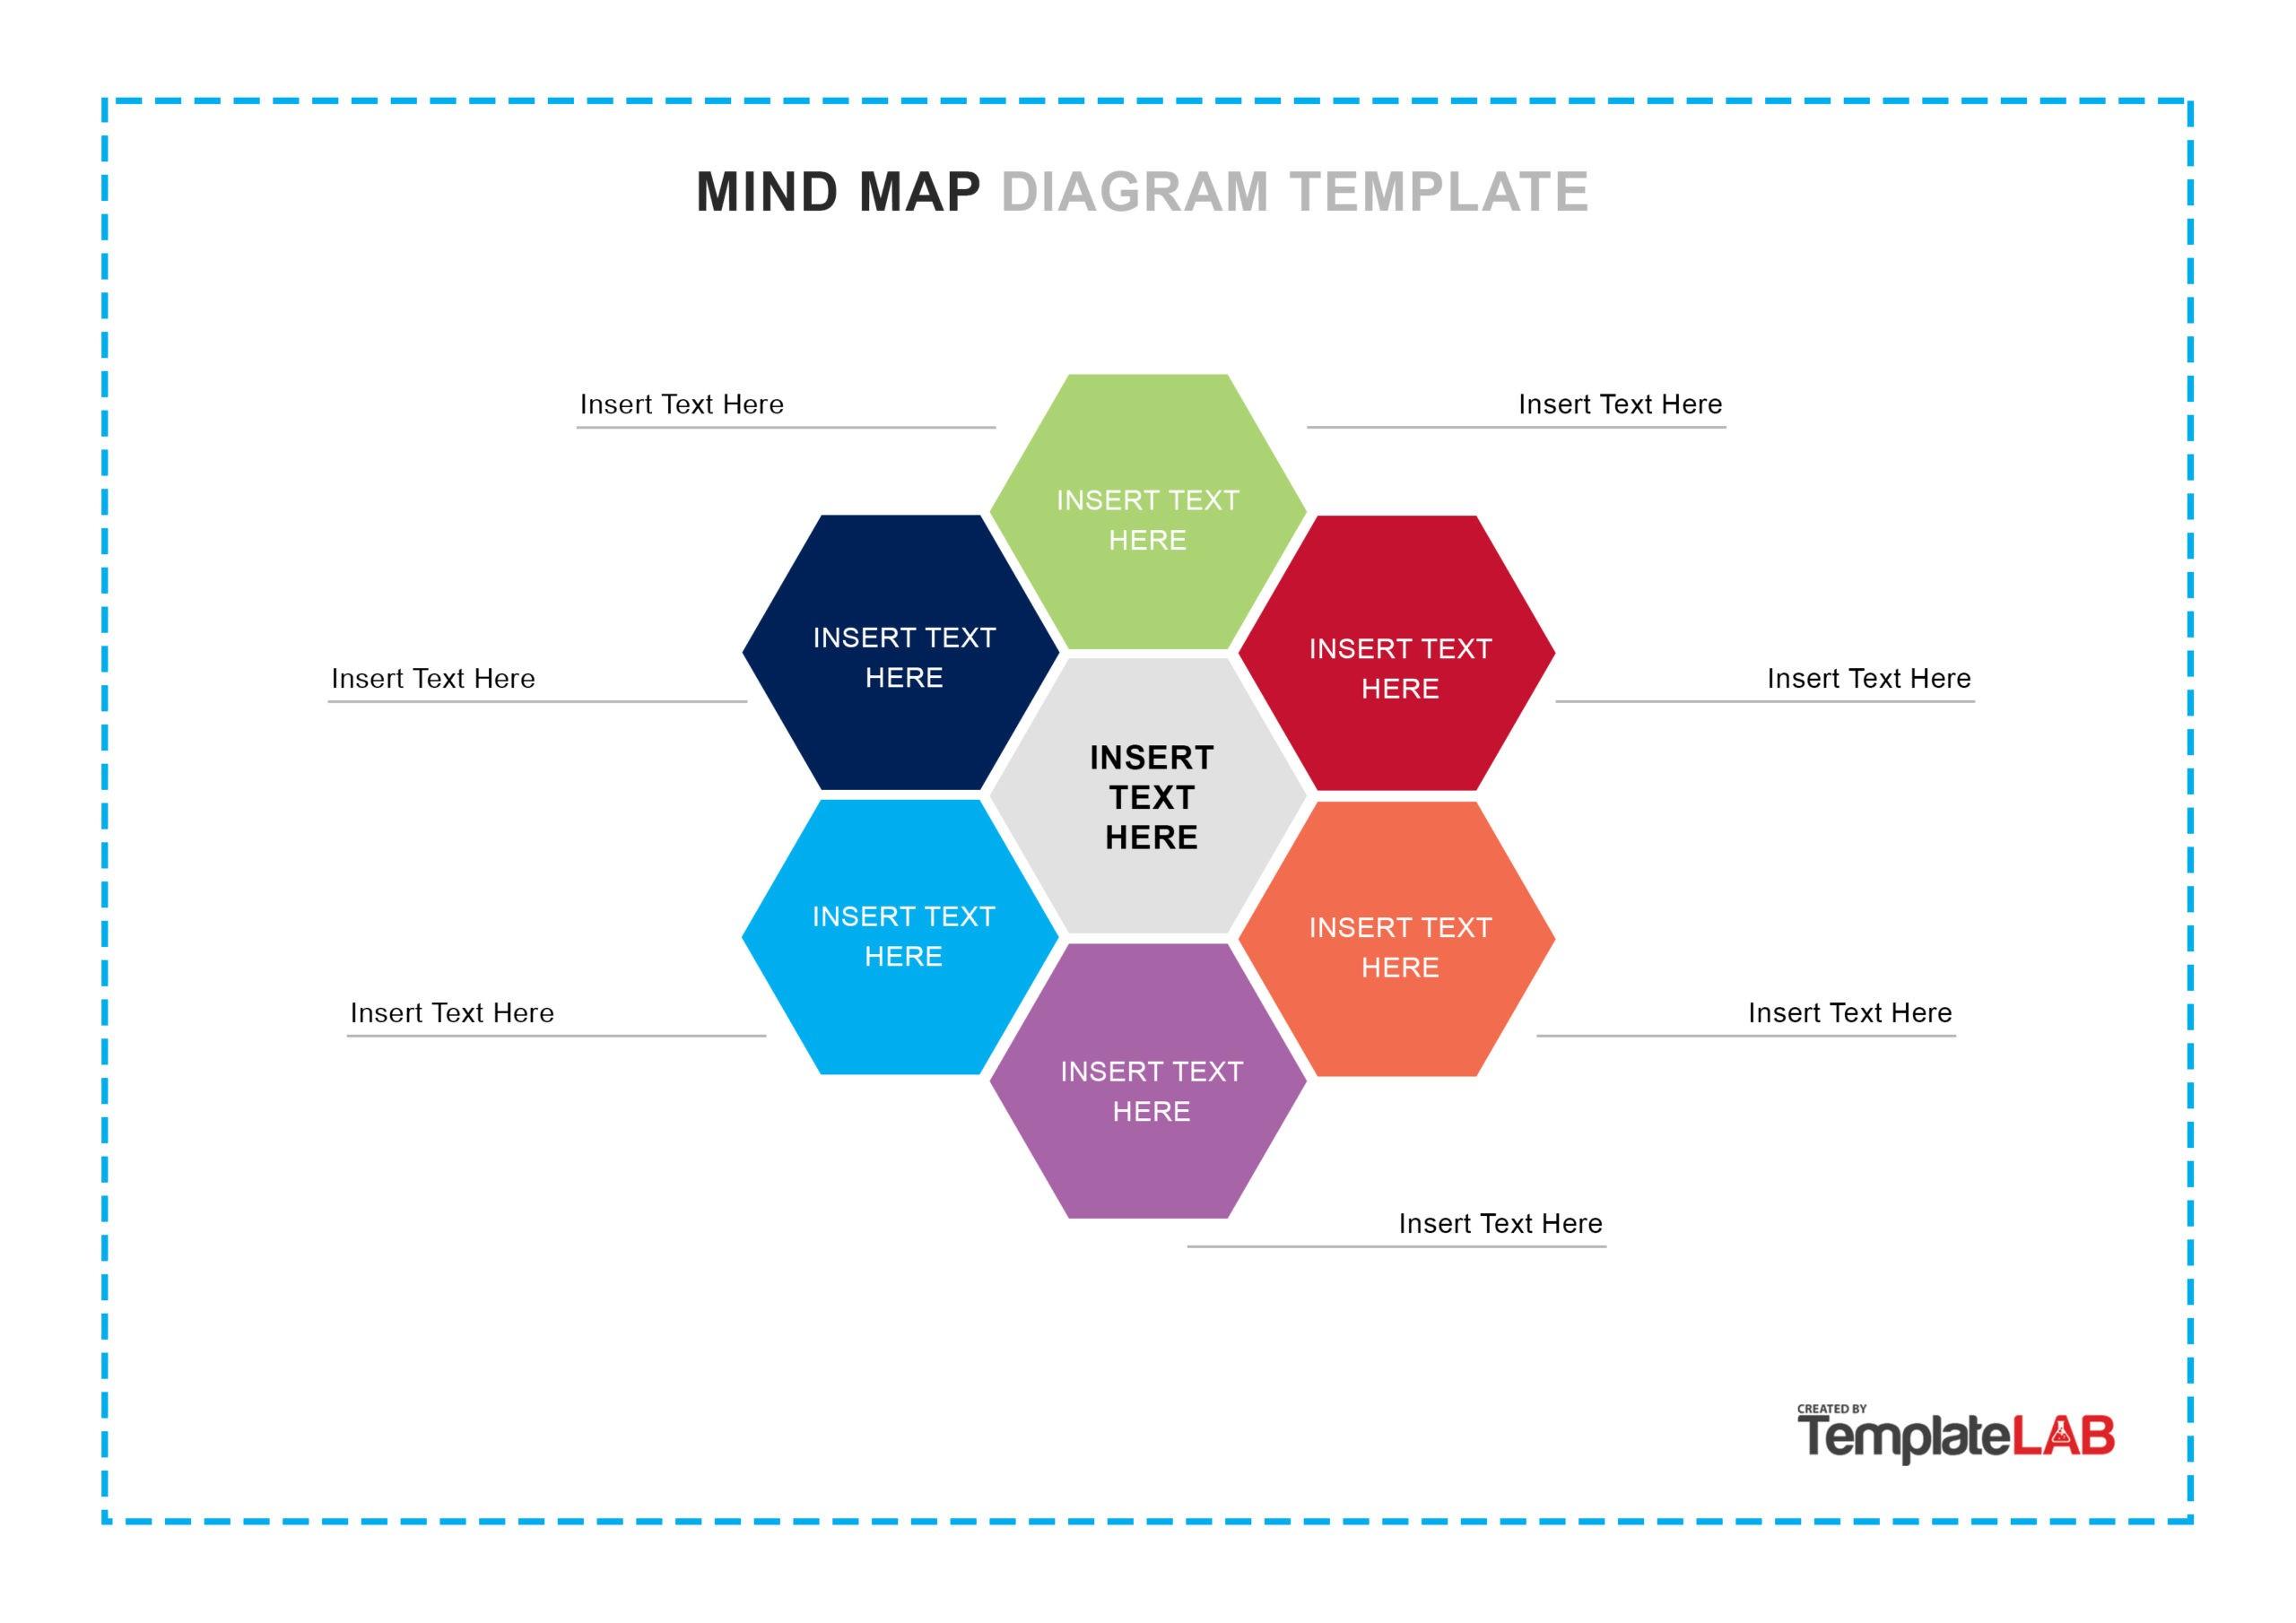 Free Mind Map Template 04 - TemplateLab.com